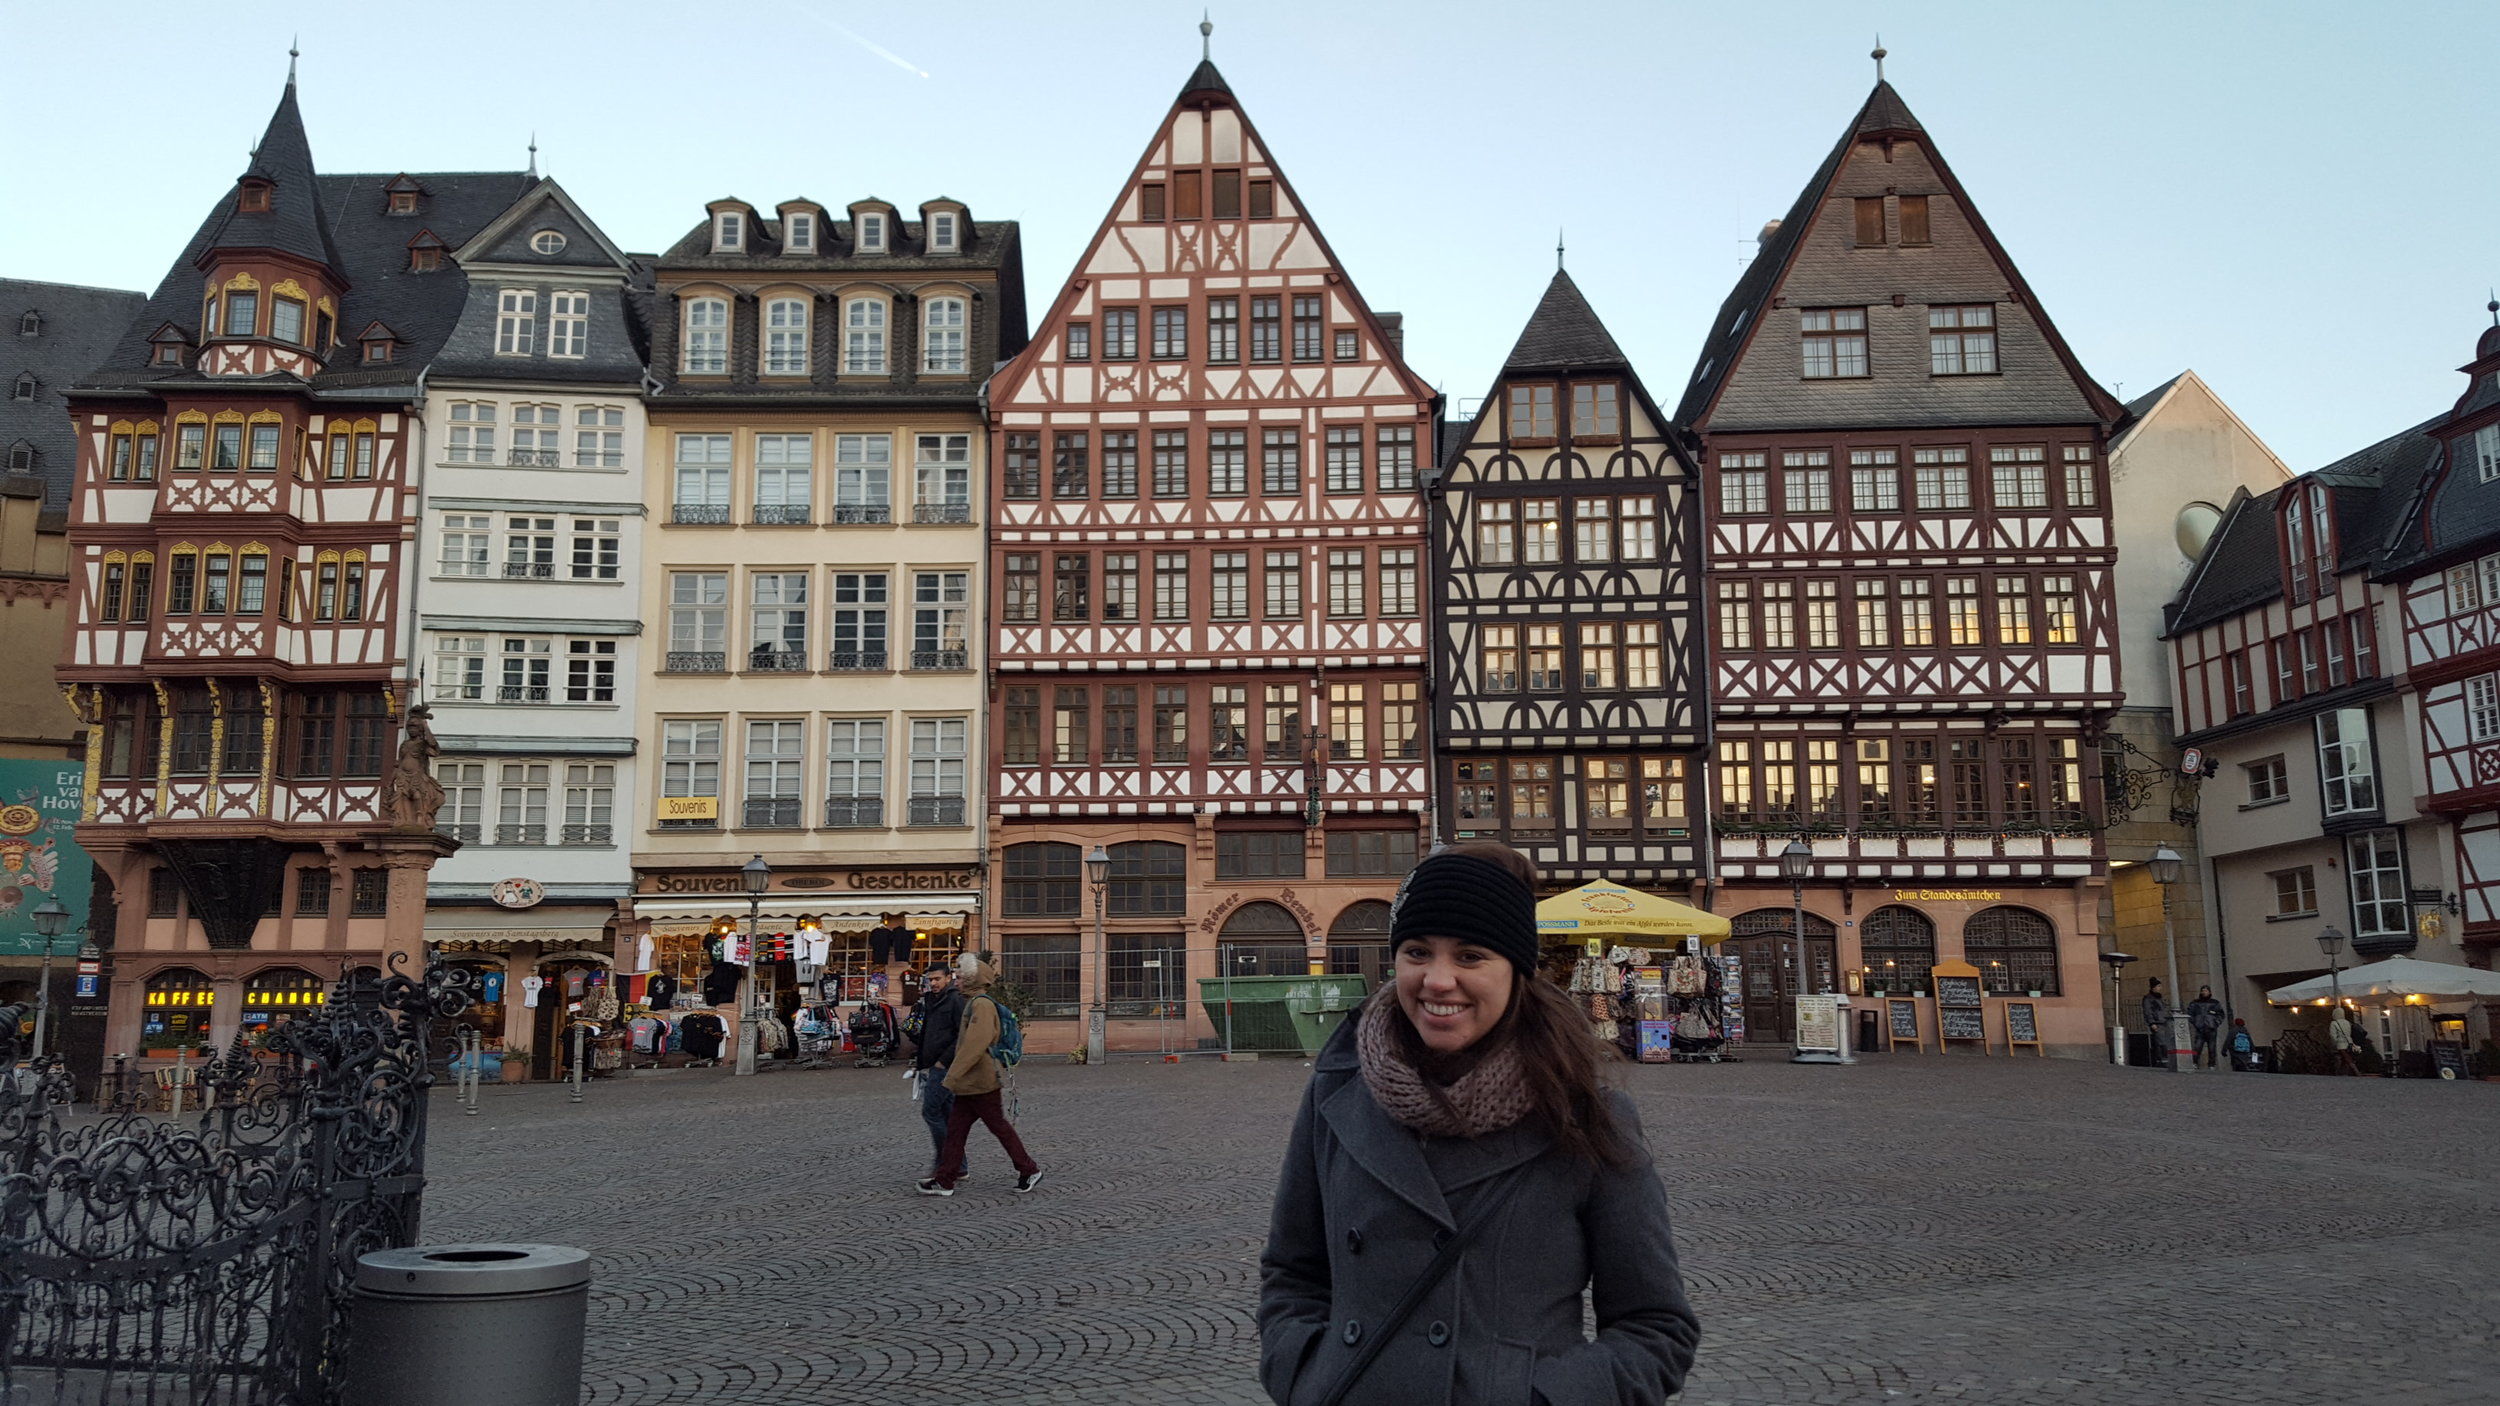 27-year-old Christian womderful woman Jessi